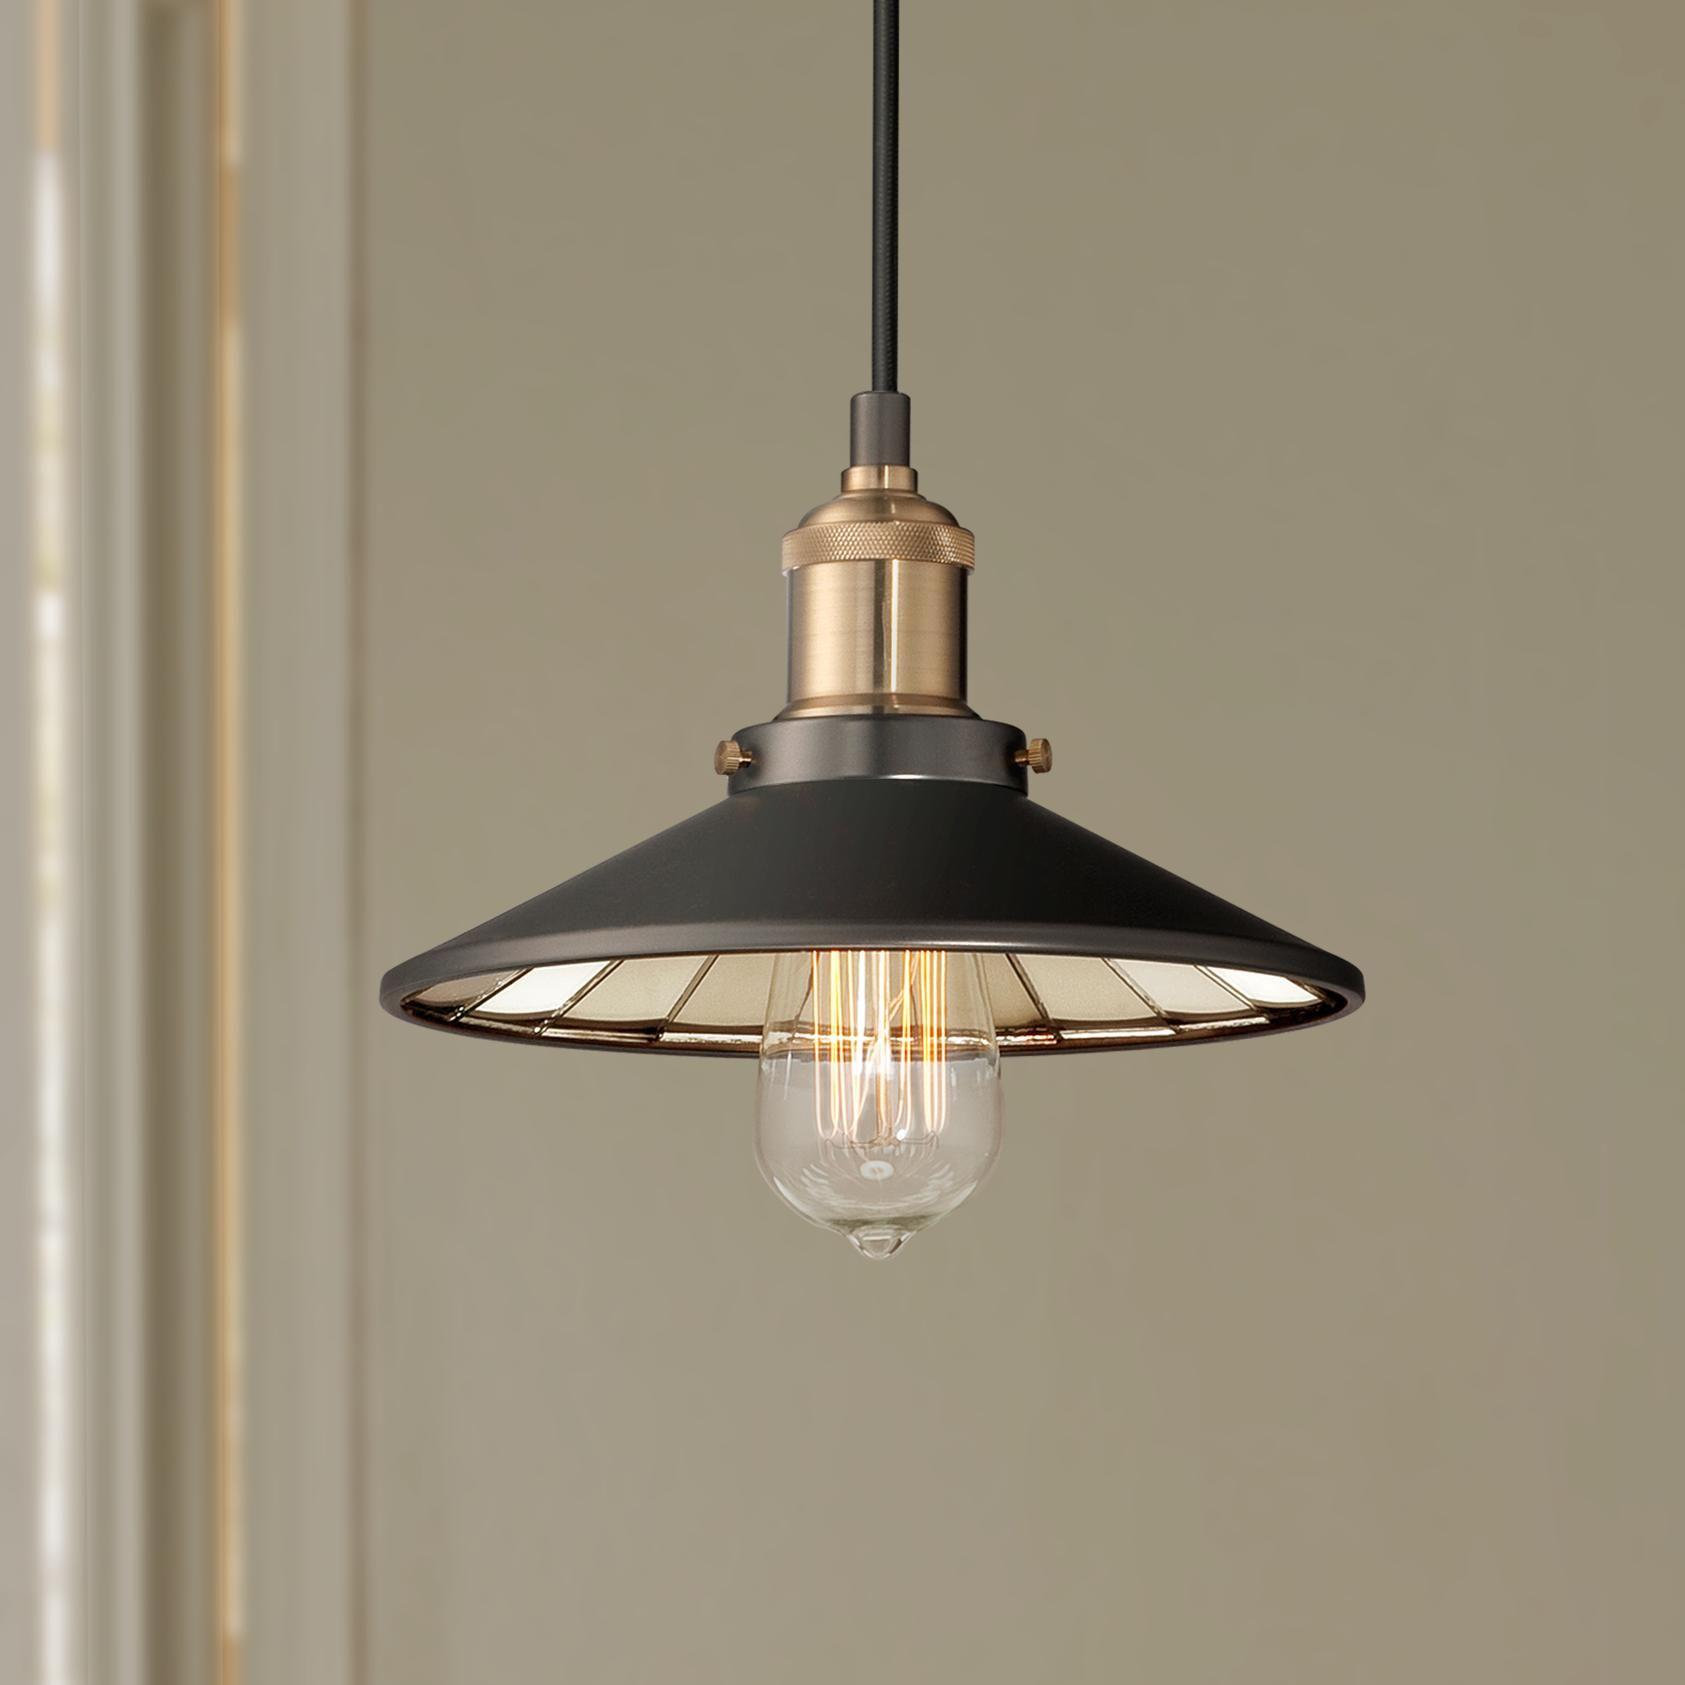 8 Heads Vintage Industrial Ceiling Lamp Edison Light Chandelier Pendant Lighting Retro Chandelier Pendant Ceiling Lamp Ceiling Pendant Lights